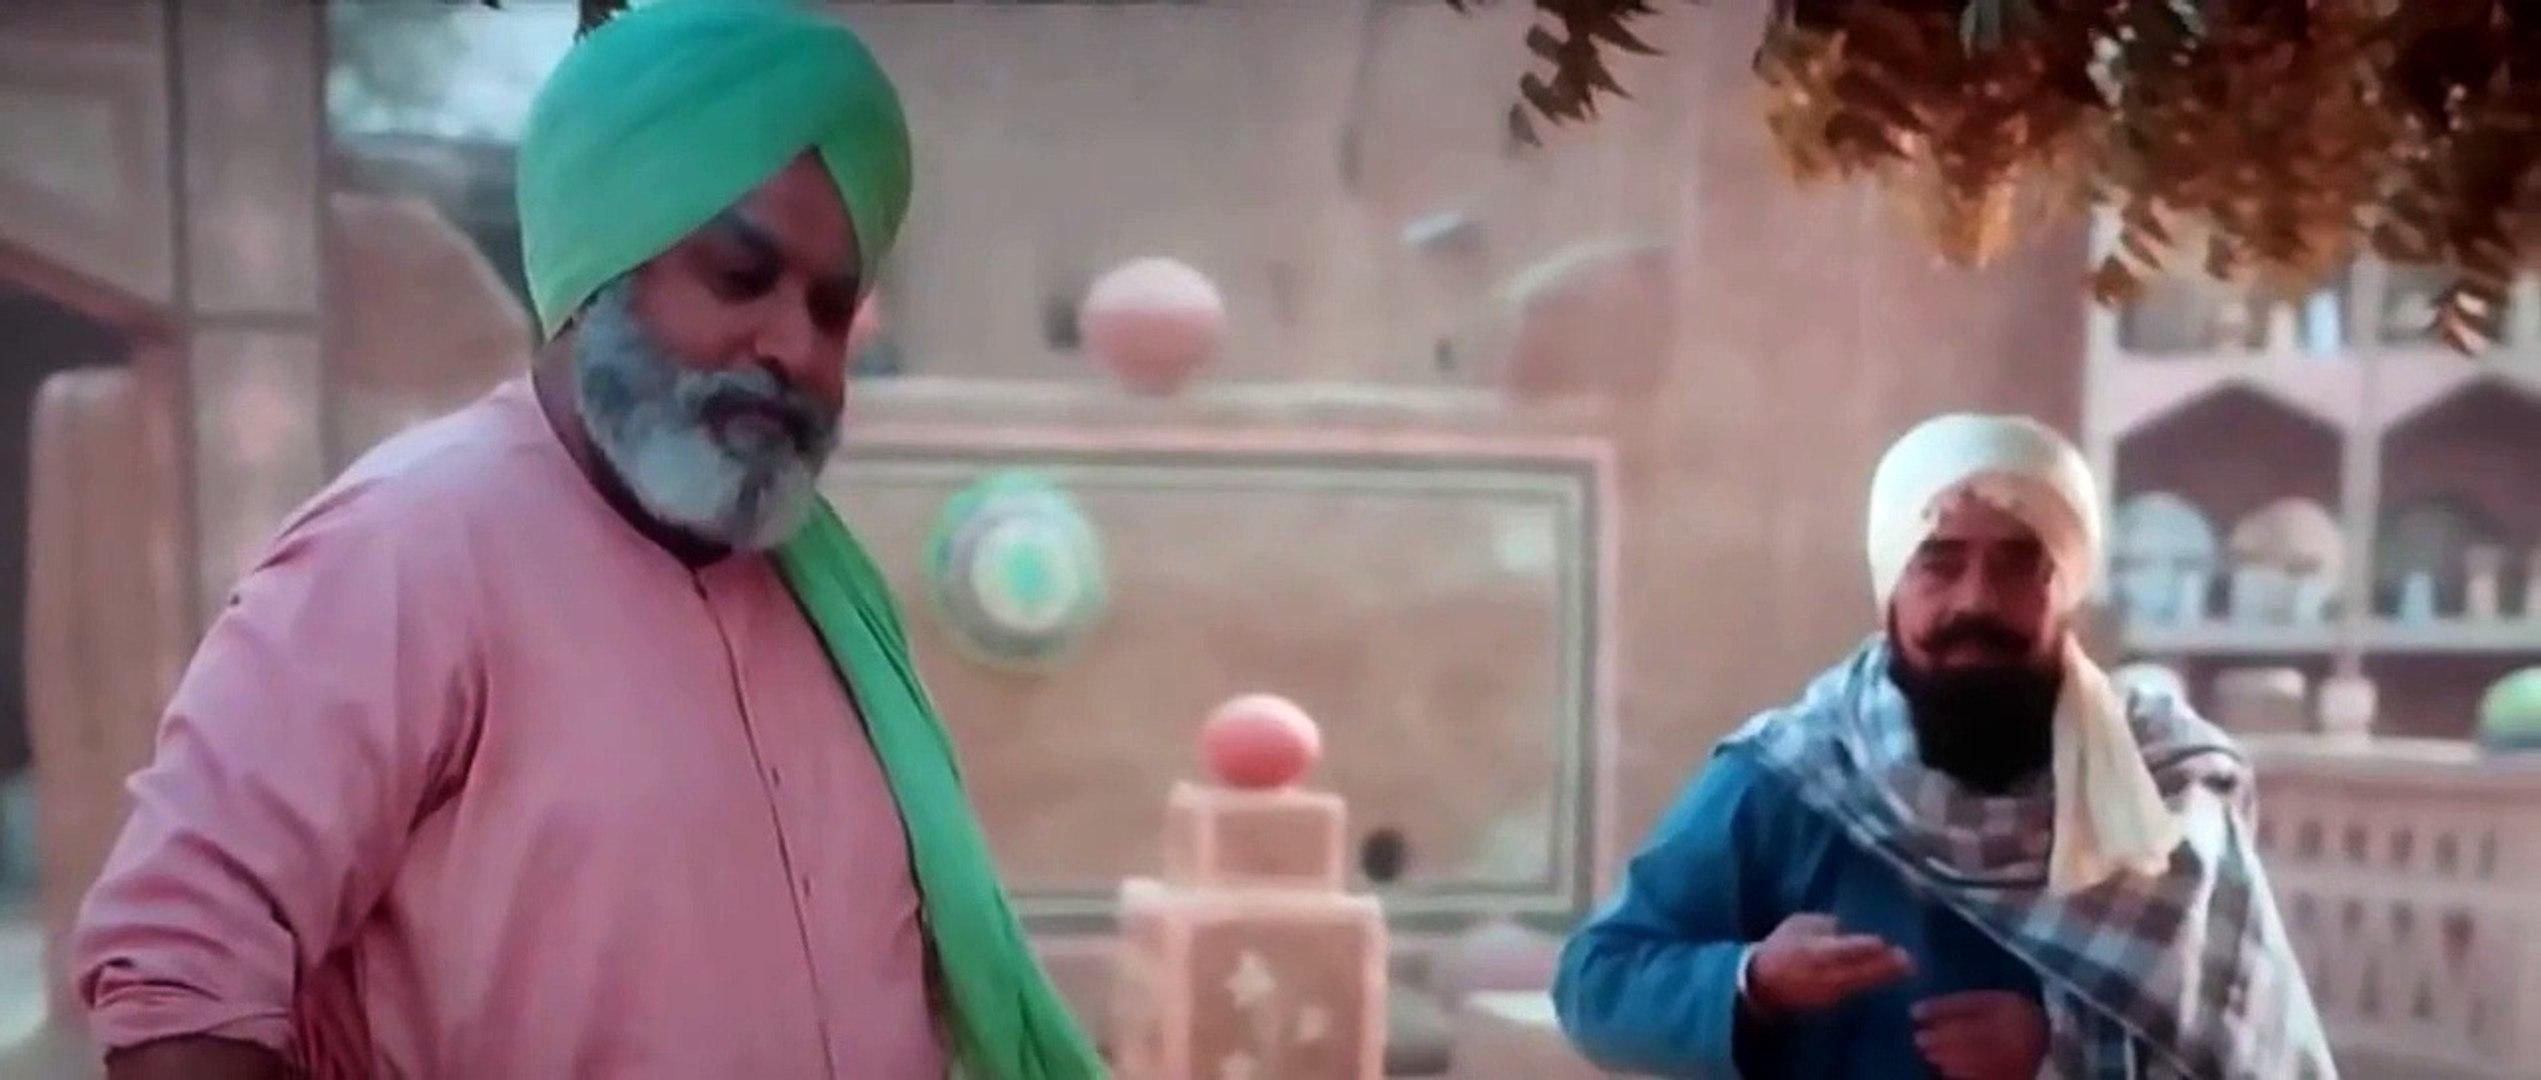 Nadhoo Khan (2019) full Punjabi movie Part 3 - 3